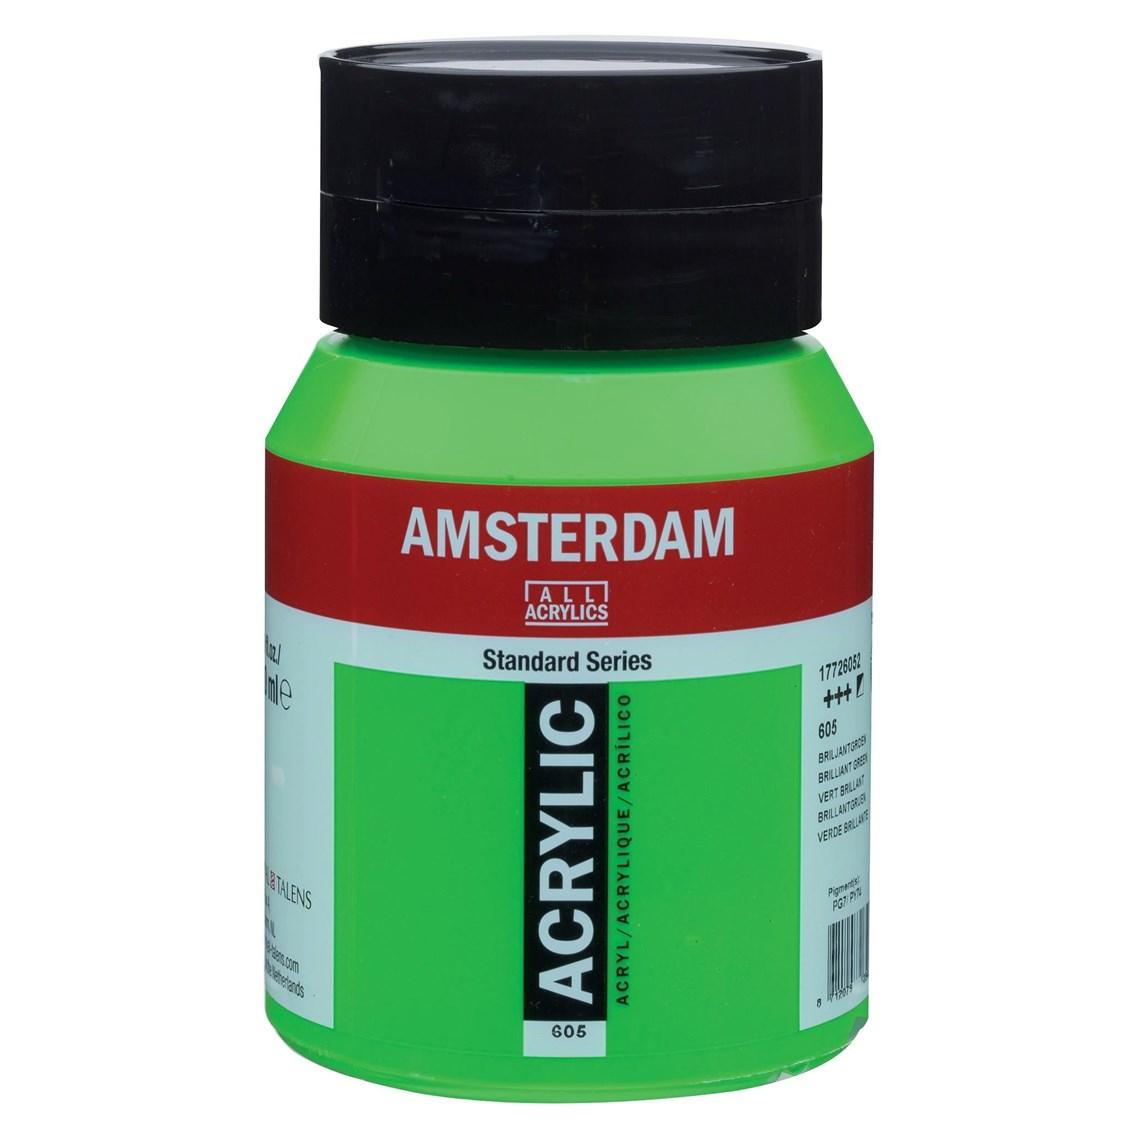 Amsterdam acrylverf Briljantgroen 605